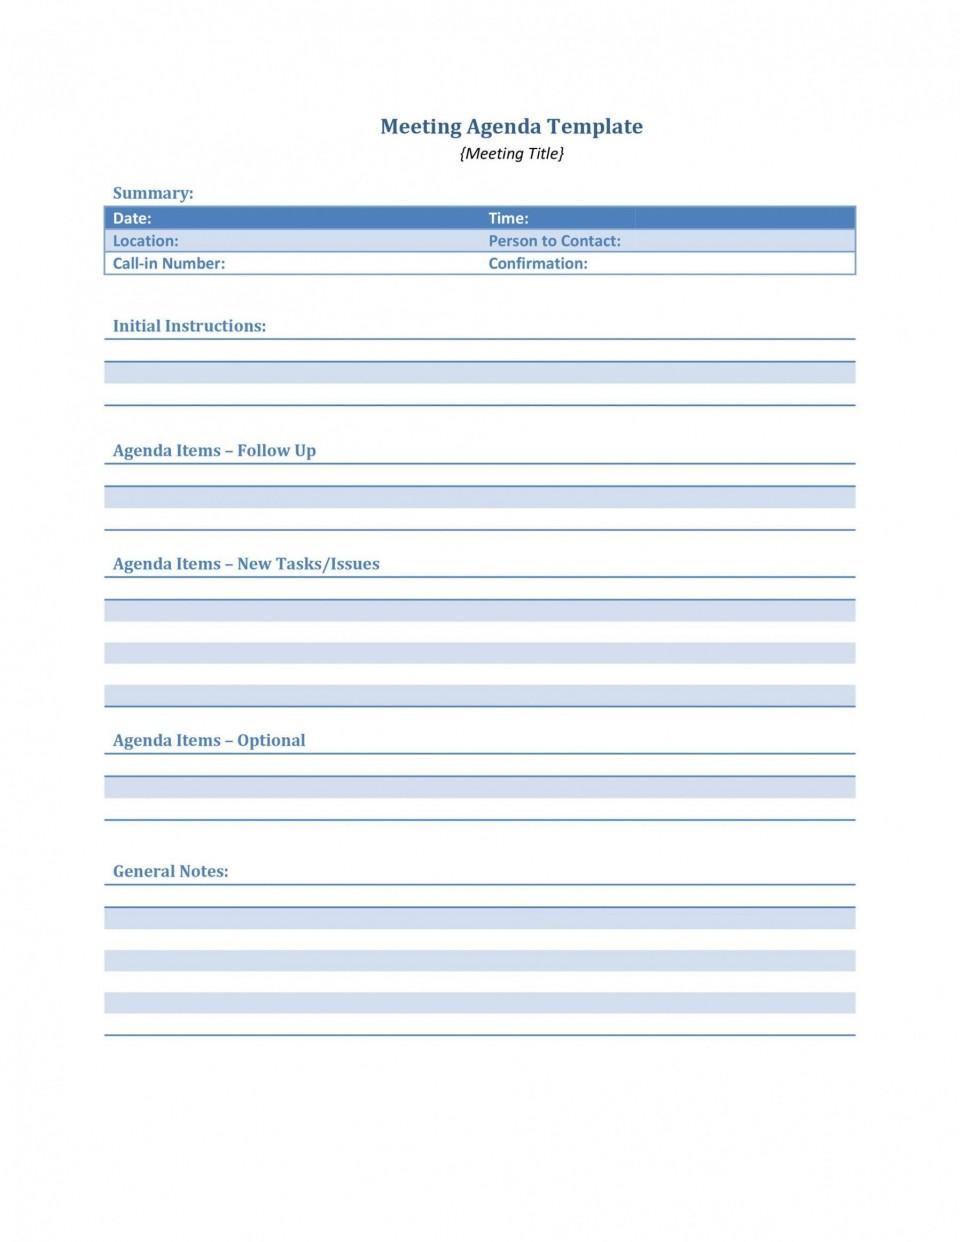 004 Phenomenal Meeting Agenda Template Word Idea  Microsoft Board 2010 Example960